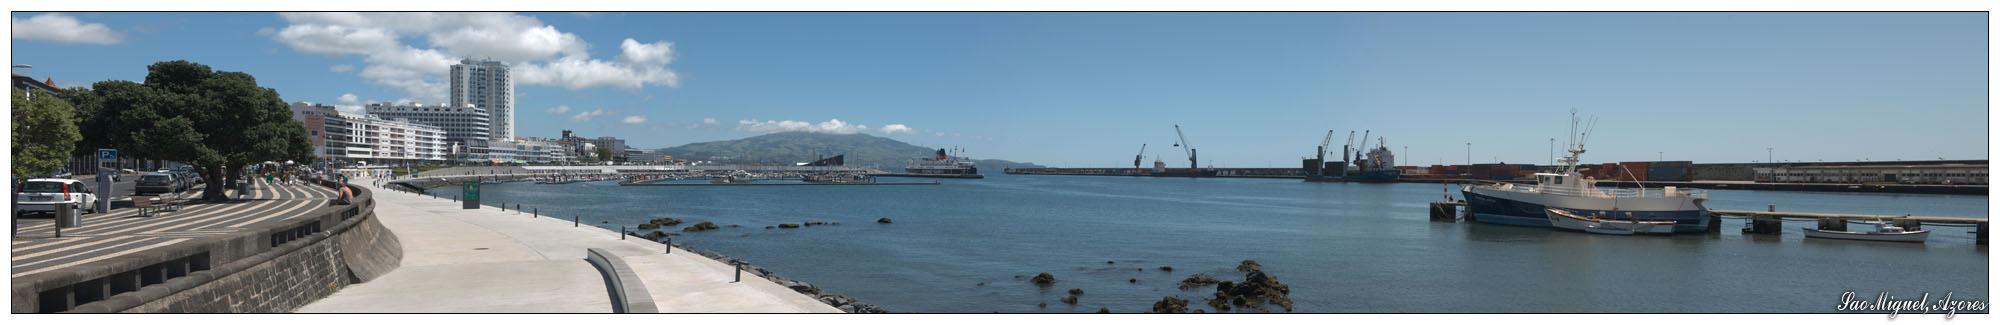 Ponta Delgada -6- (Sao Miguel, Azoren)